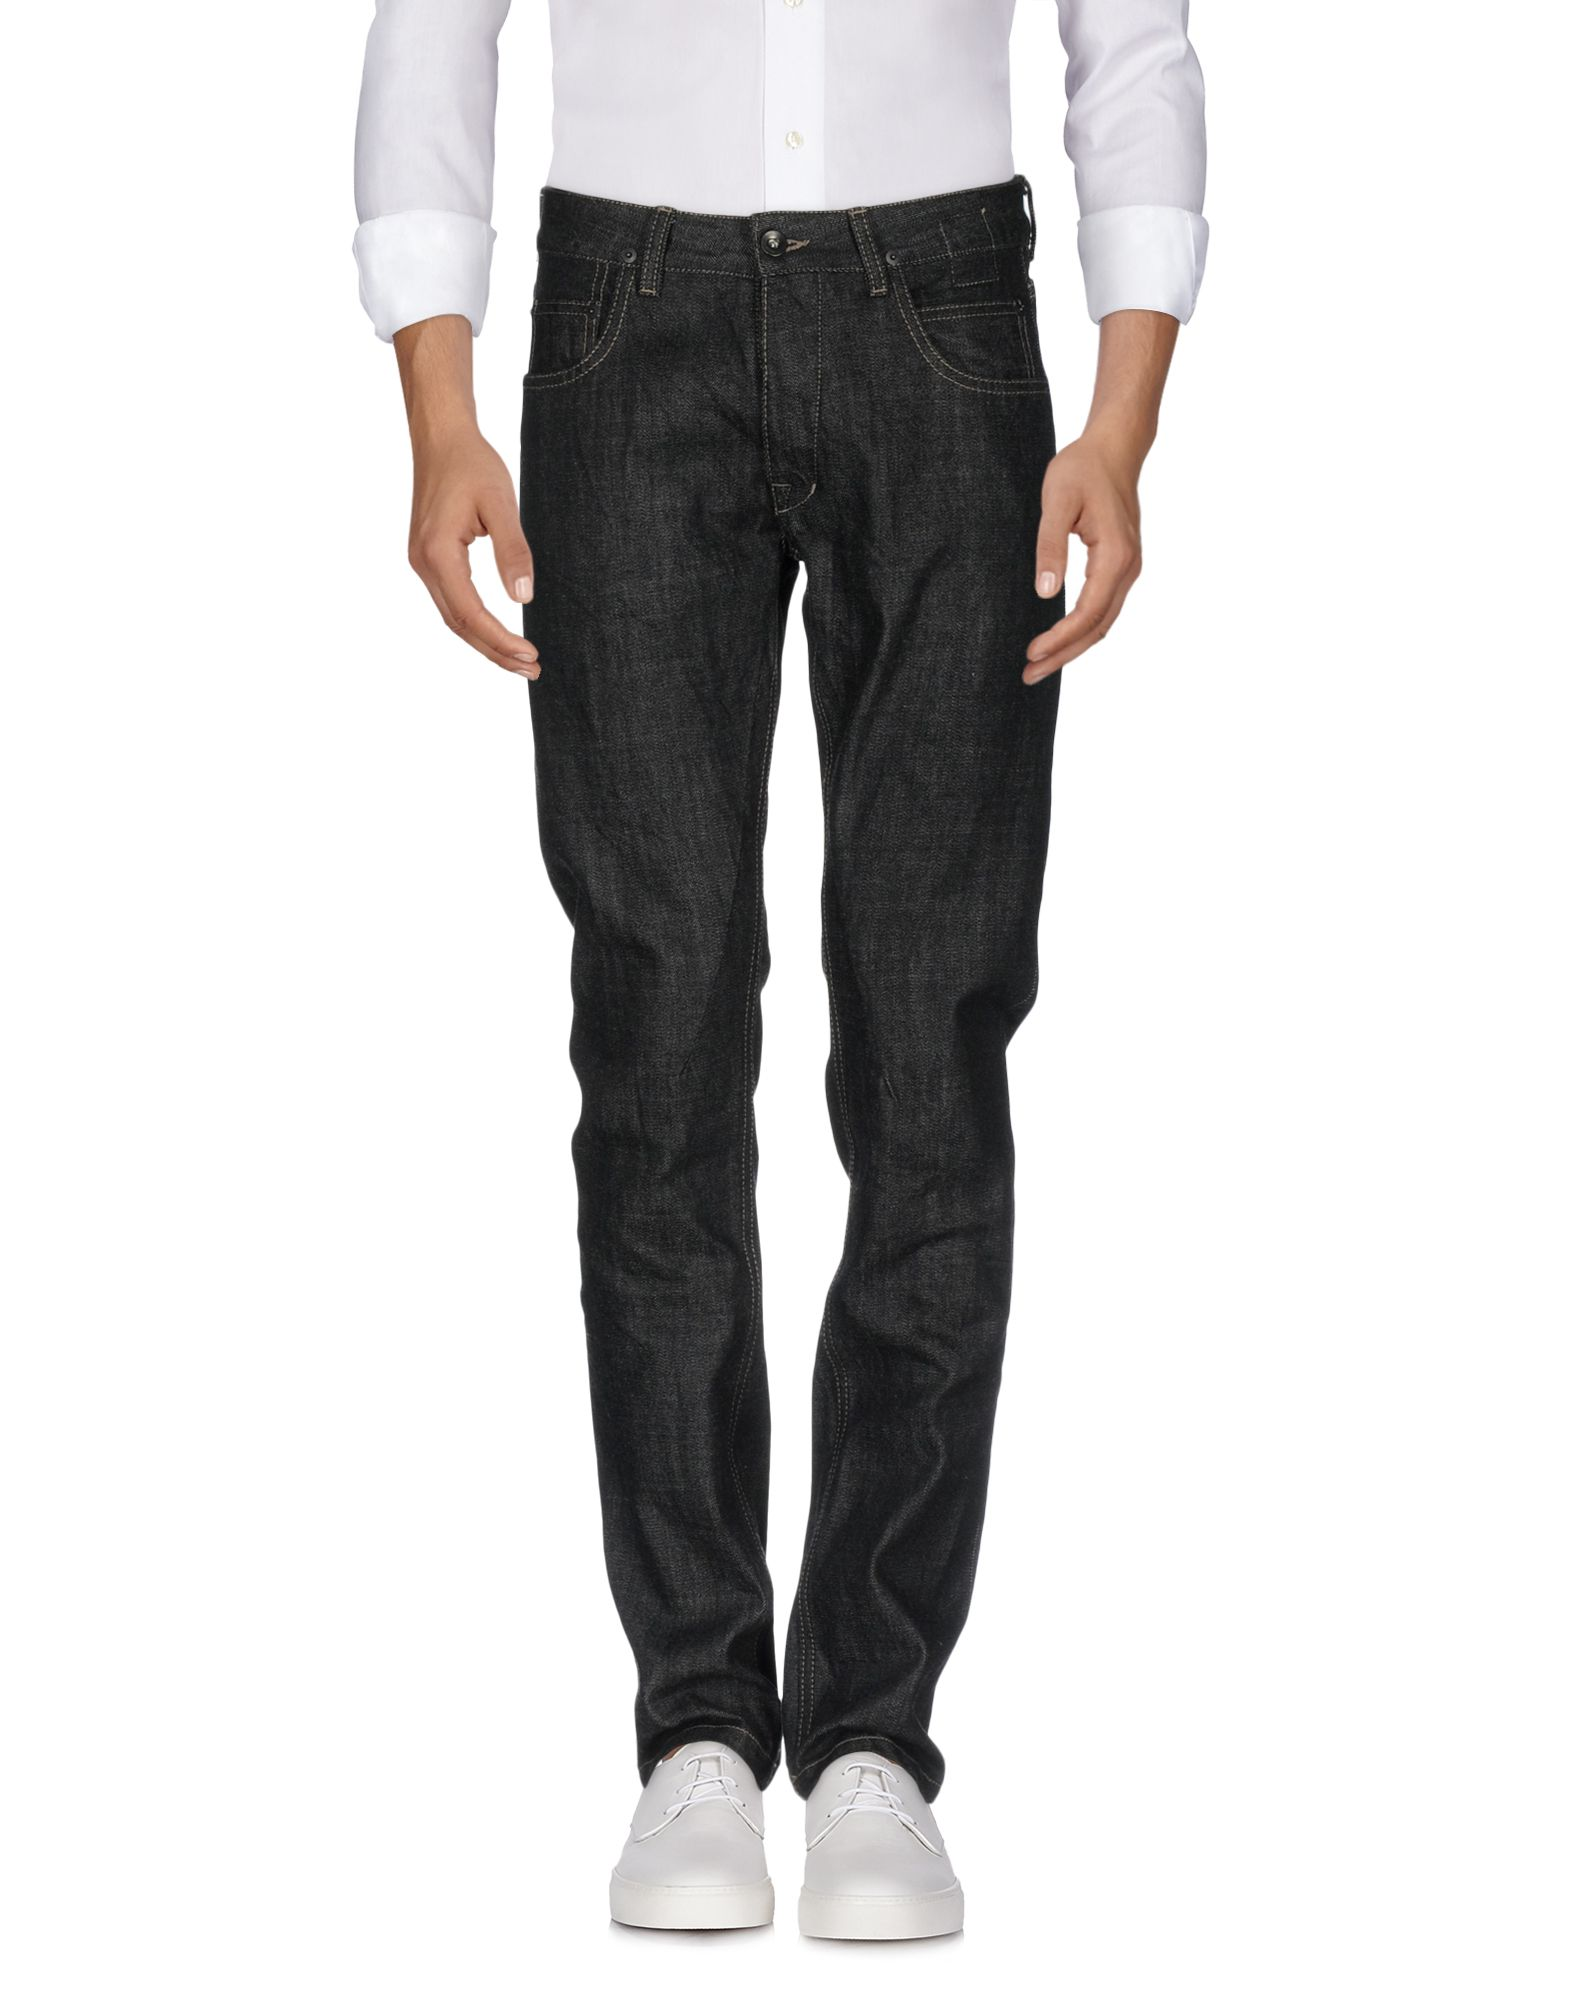 Pantaloni Jeans Drkshdw By Rick Owens Uomo - Acquista online su